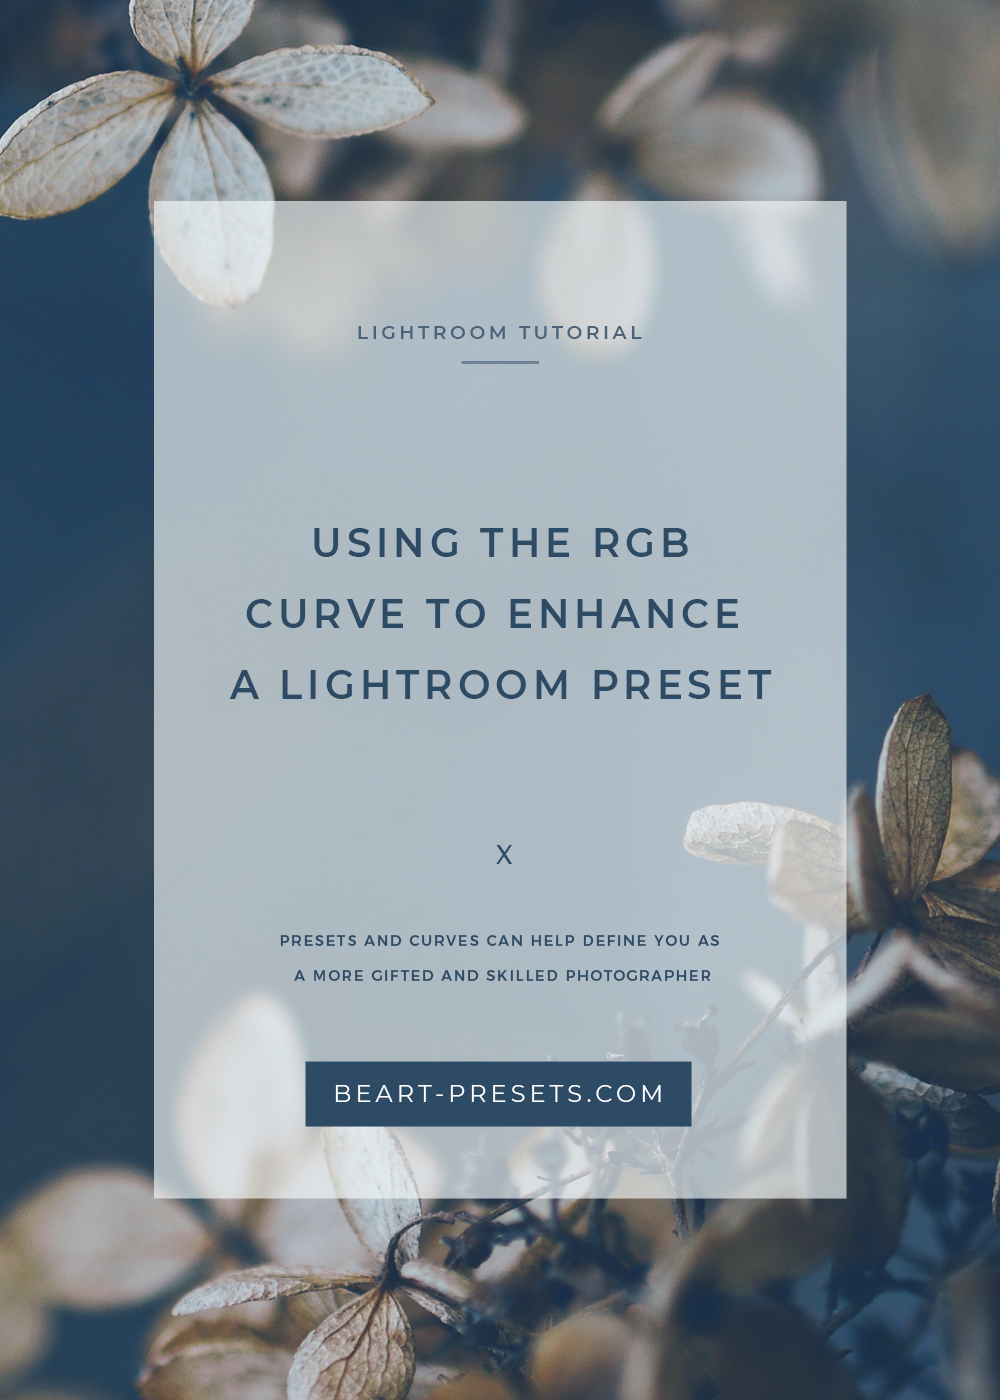 USING THE RGB CURVE TO ENHANCE A LIGHTROOM PRESET